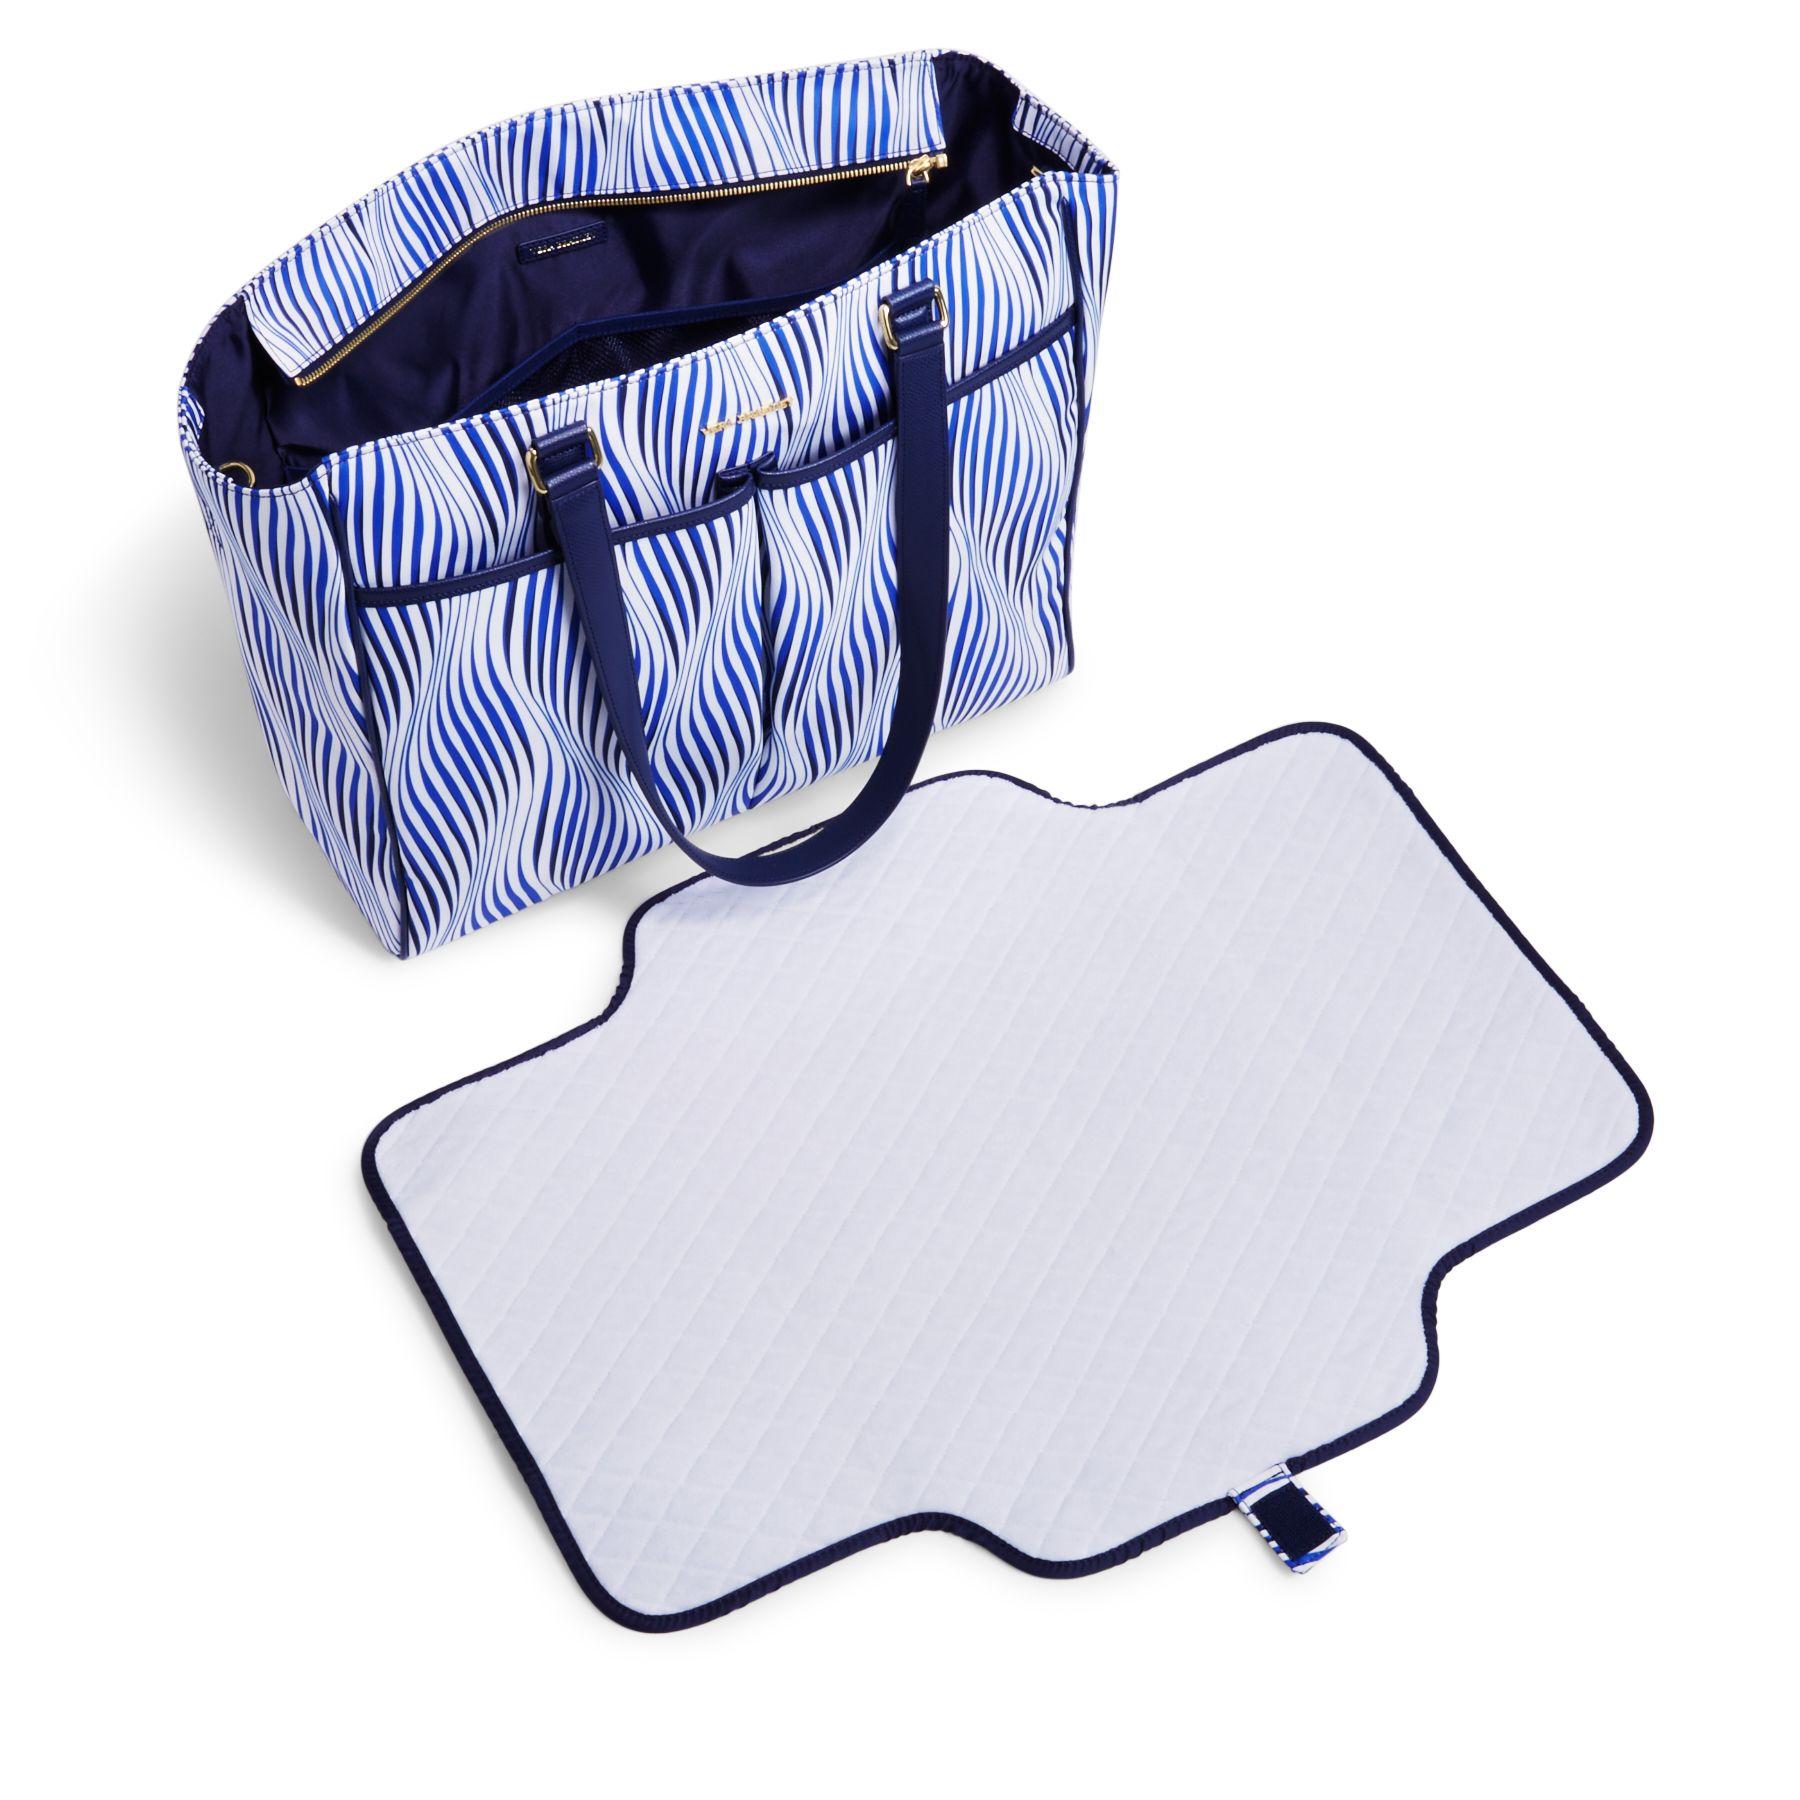 7ddfd5bebf32 Vera Bradley Uptown Baby Diaper Bag